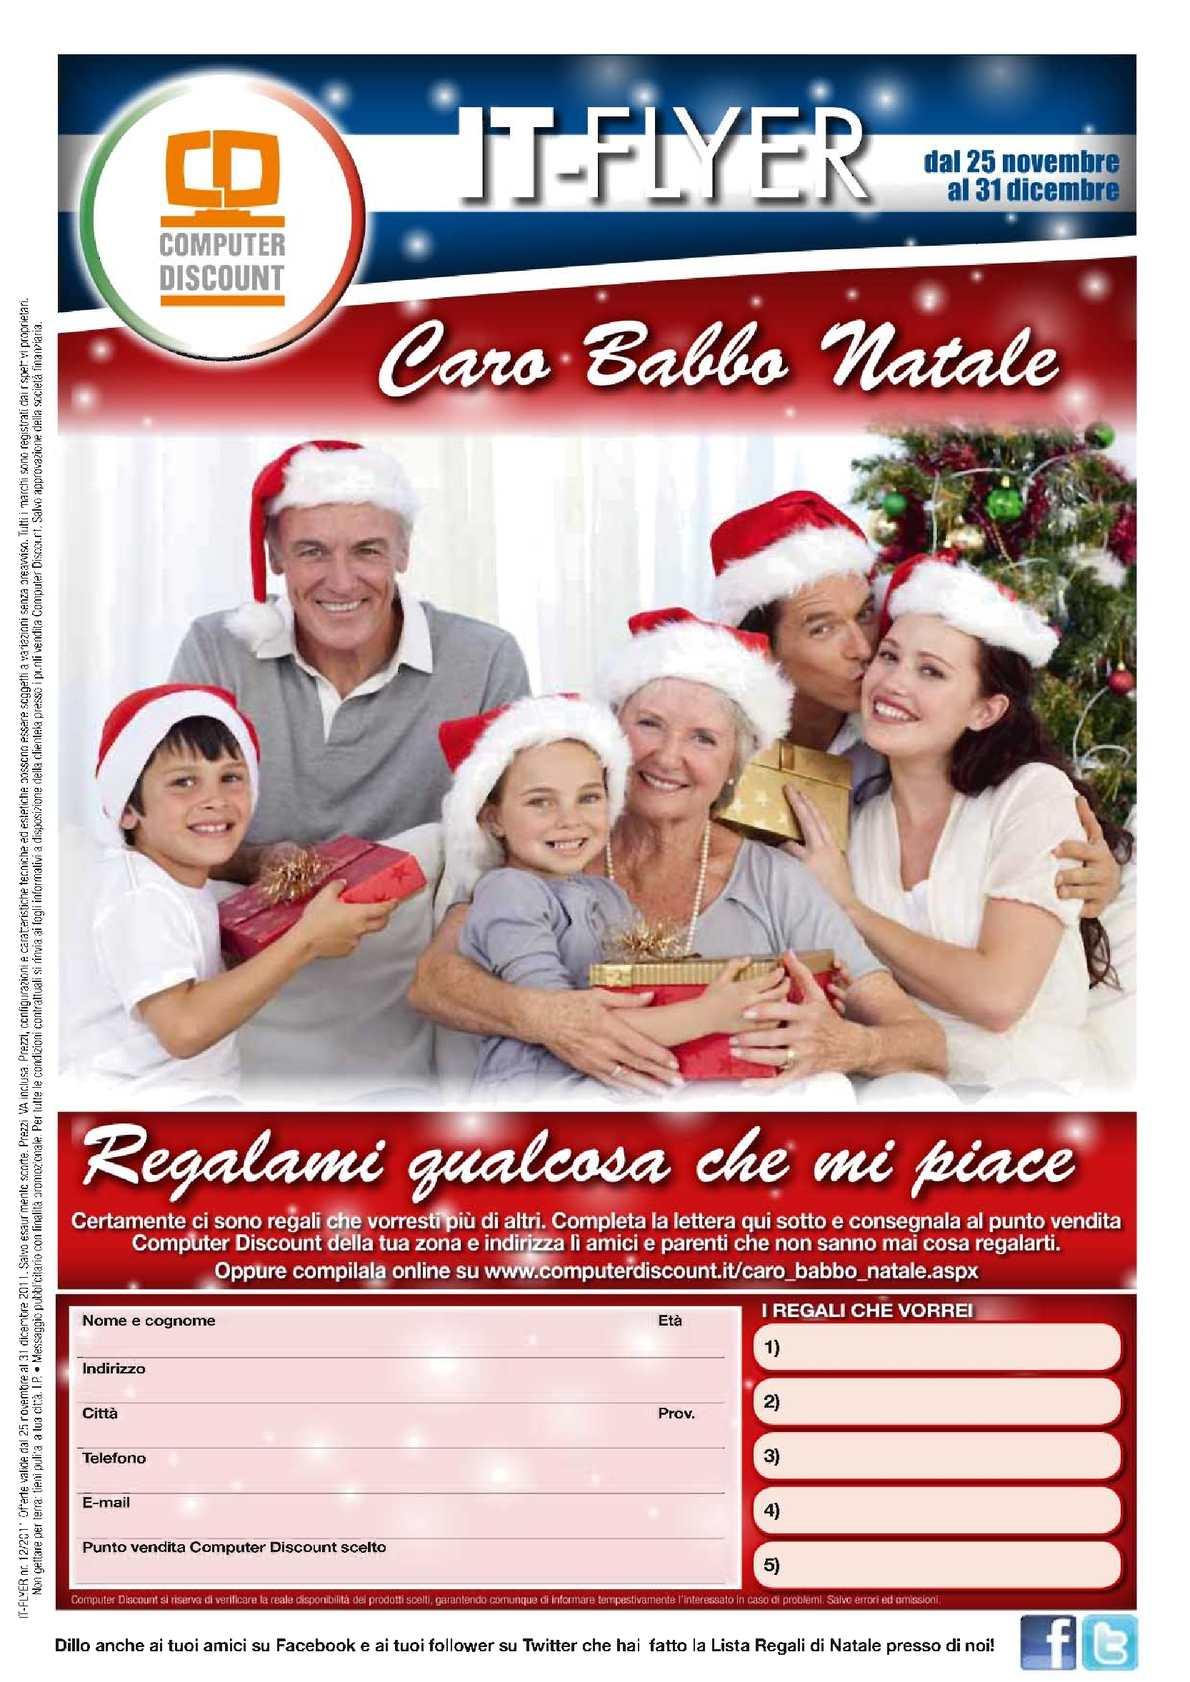 Calaméo - Volantino Computer Discount dal 25/11 al 31/12/2011